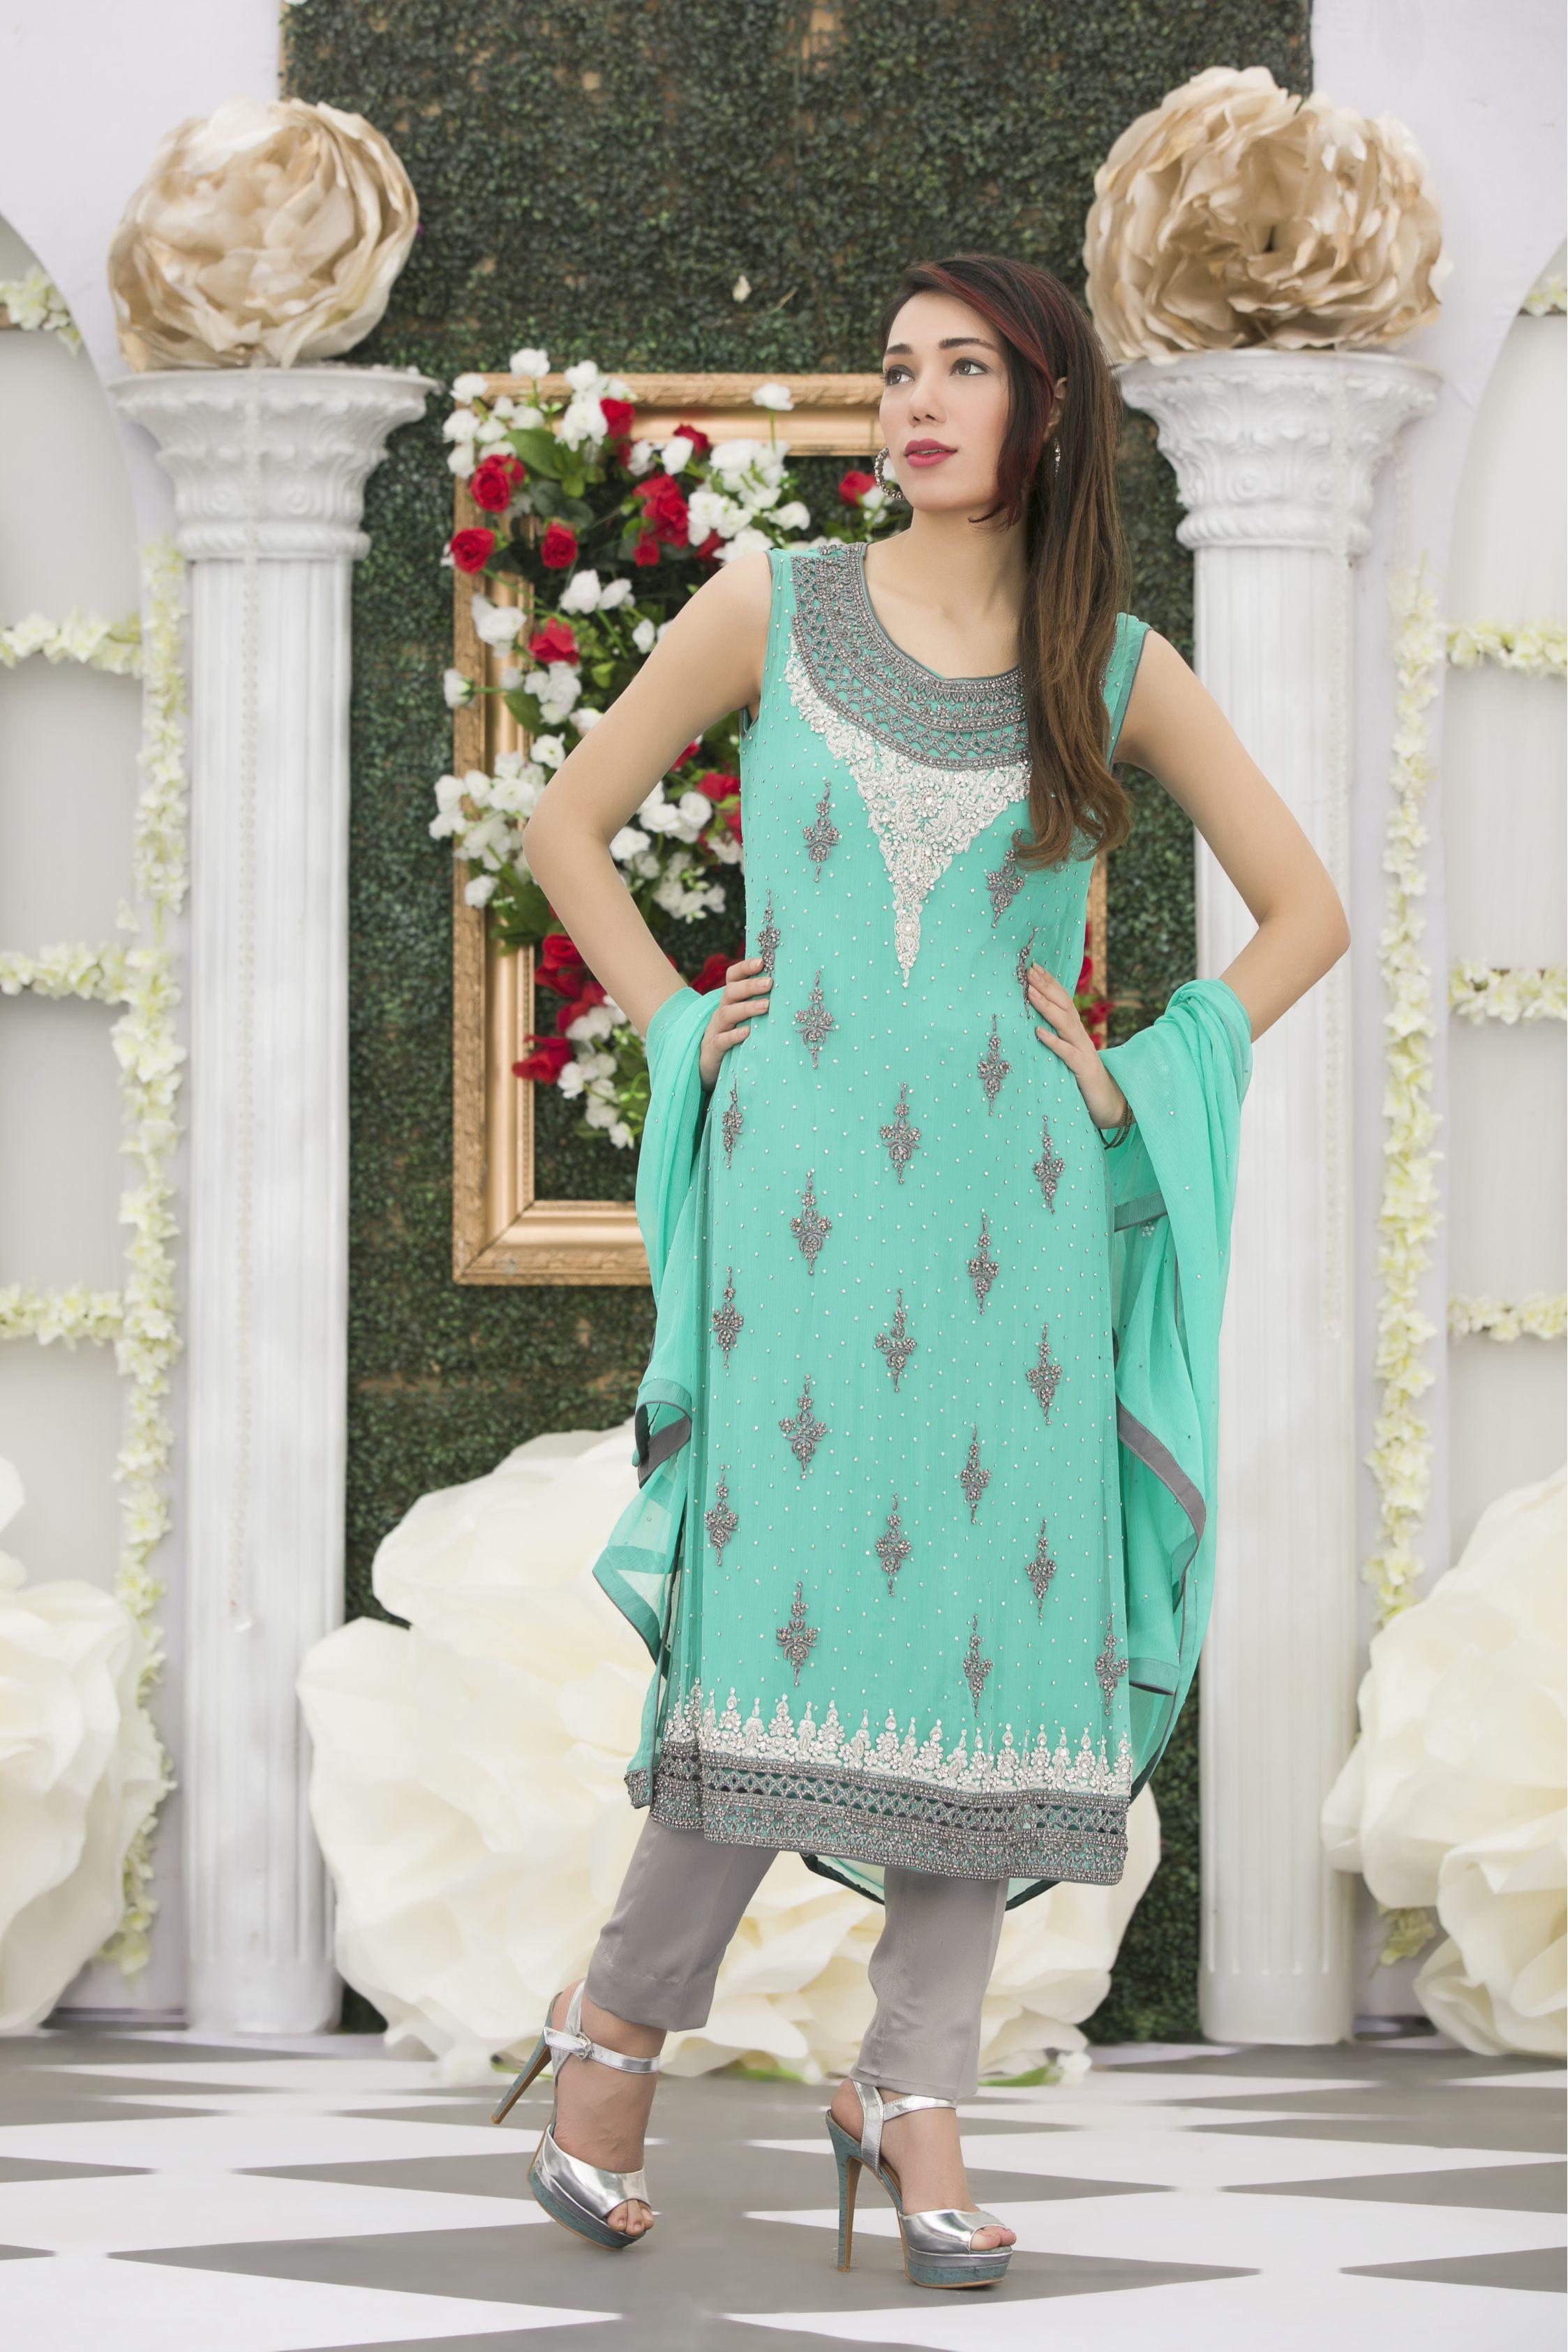 EXCLUSIVE LIGHT FIROZI BRIDAL DRESS - Exclusive Online Boutique